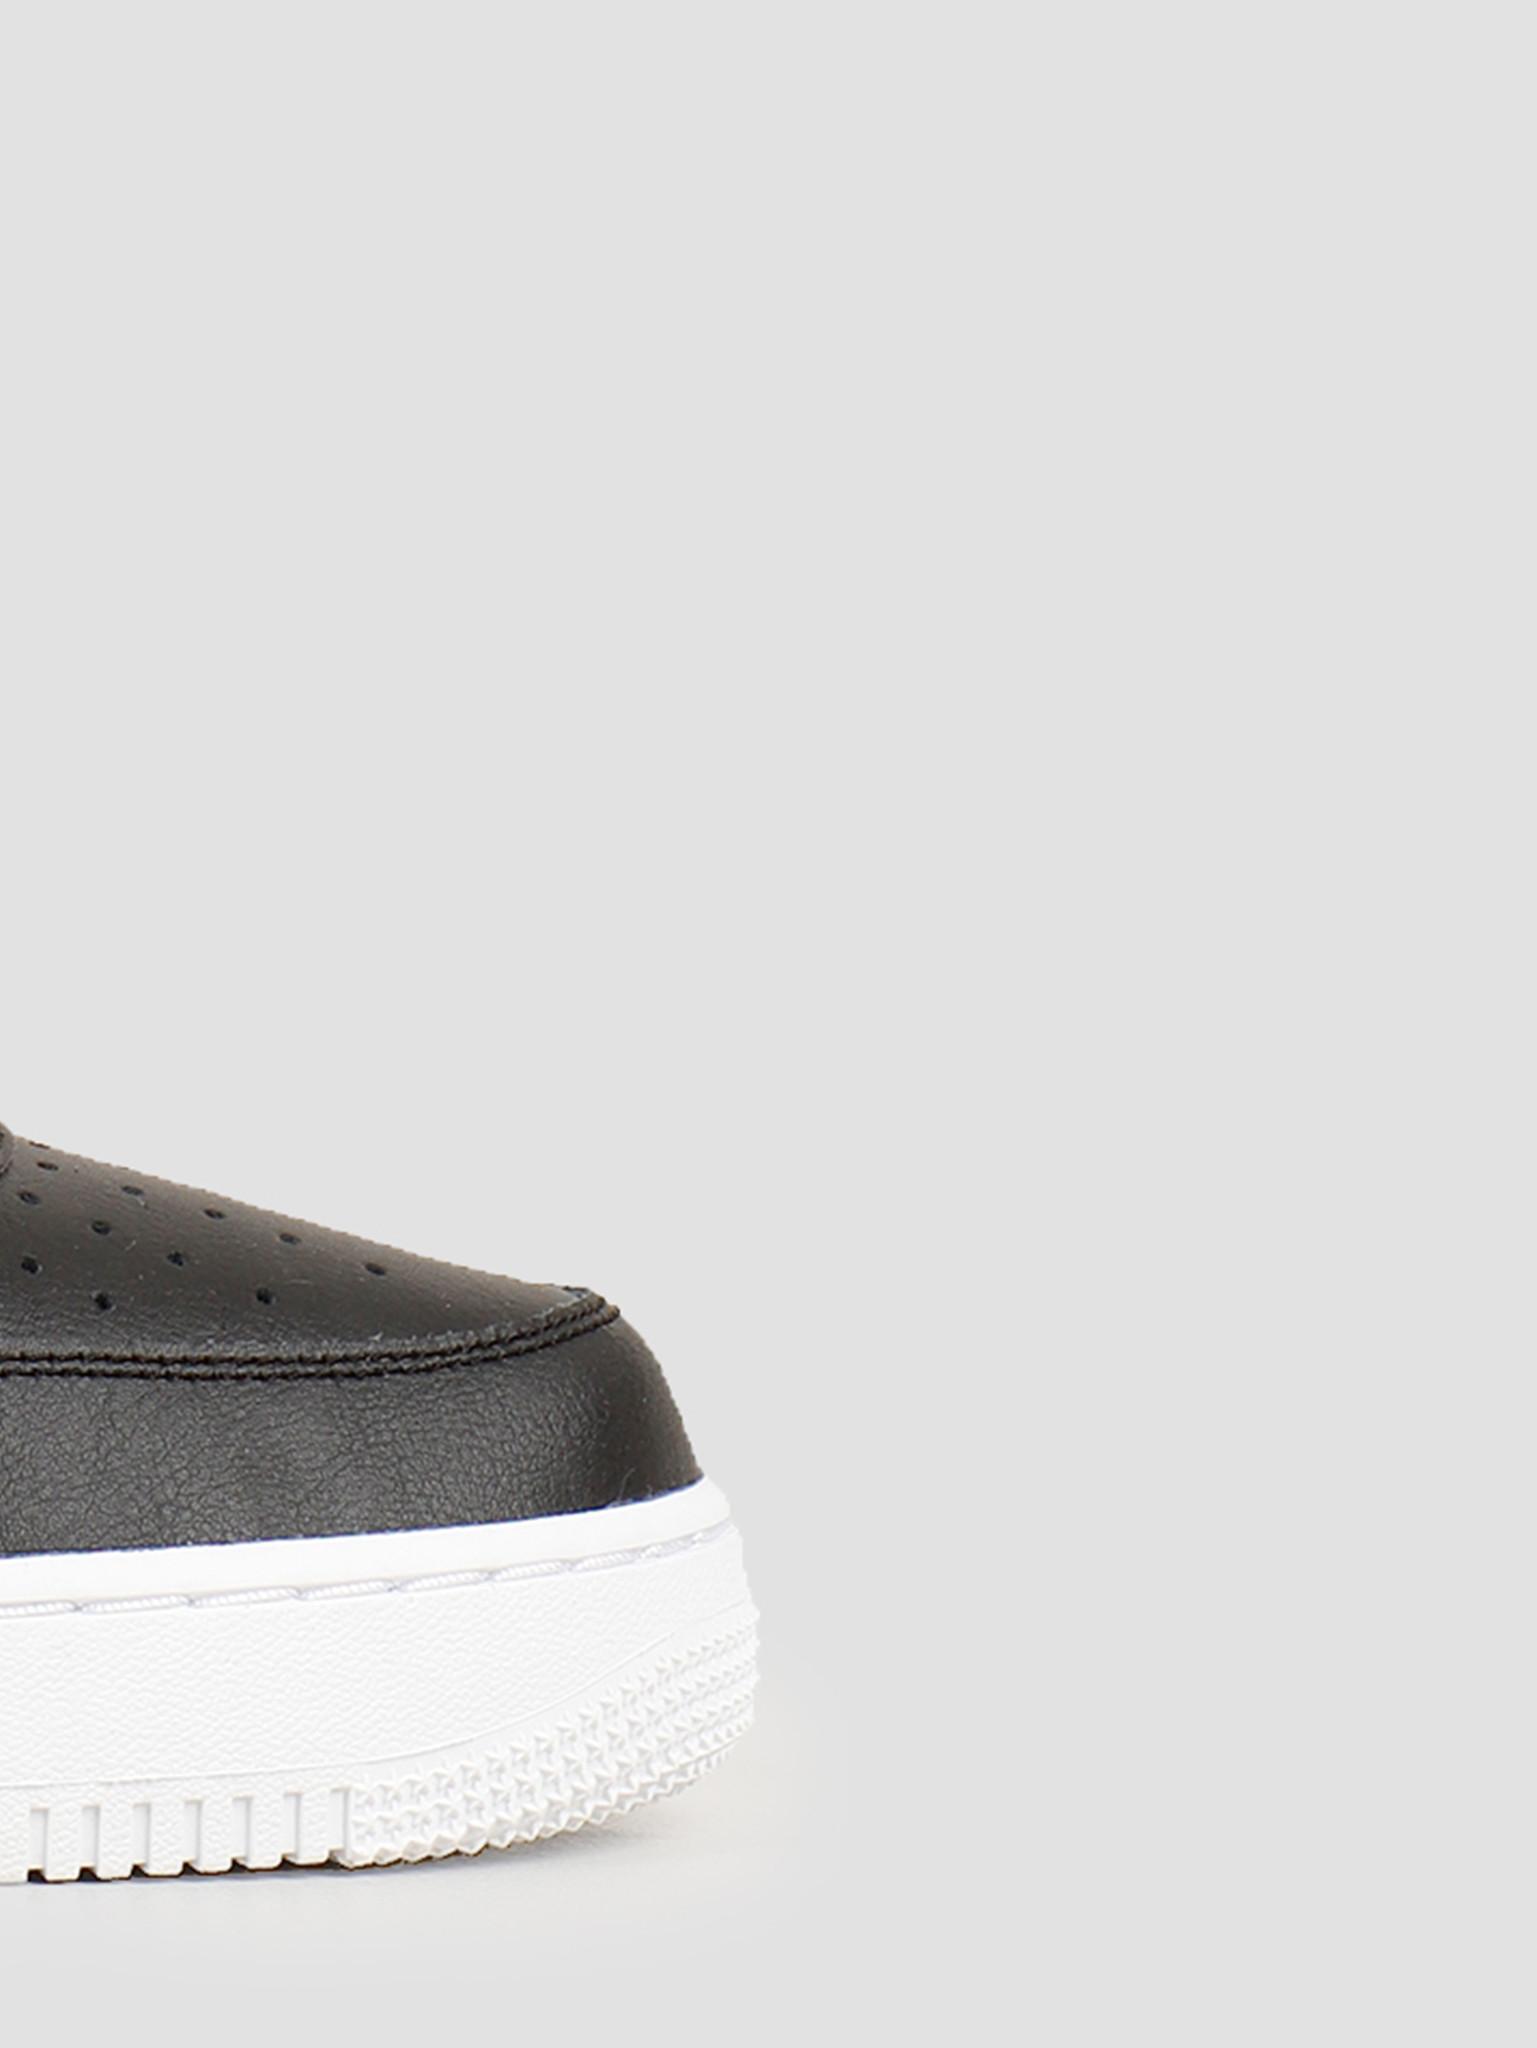 Nike Nike Air Force 1 '07 An20 Black White CJ0952-001